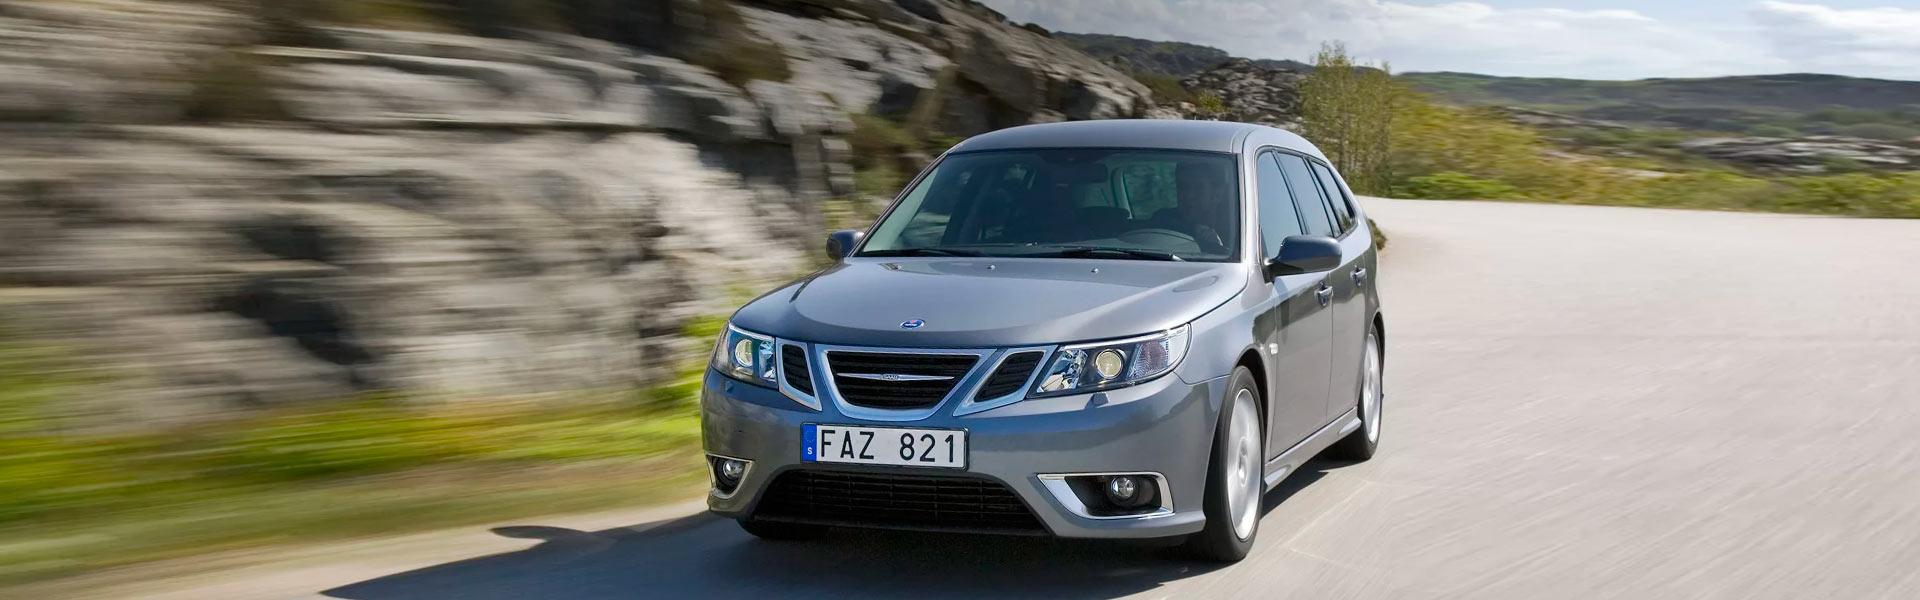 Сервис и ремонт Saab